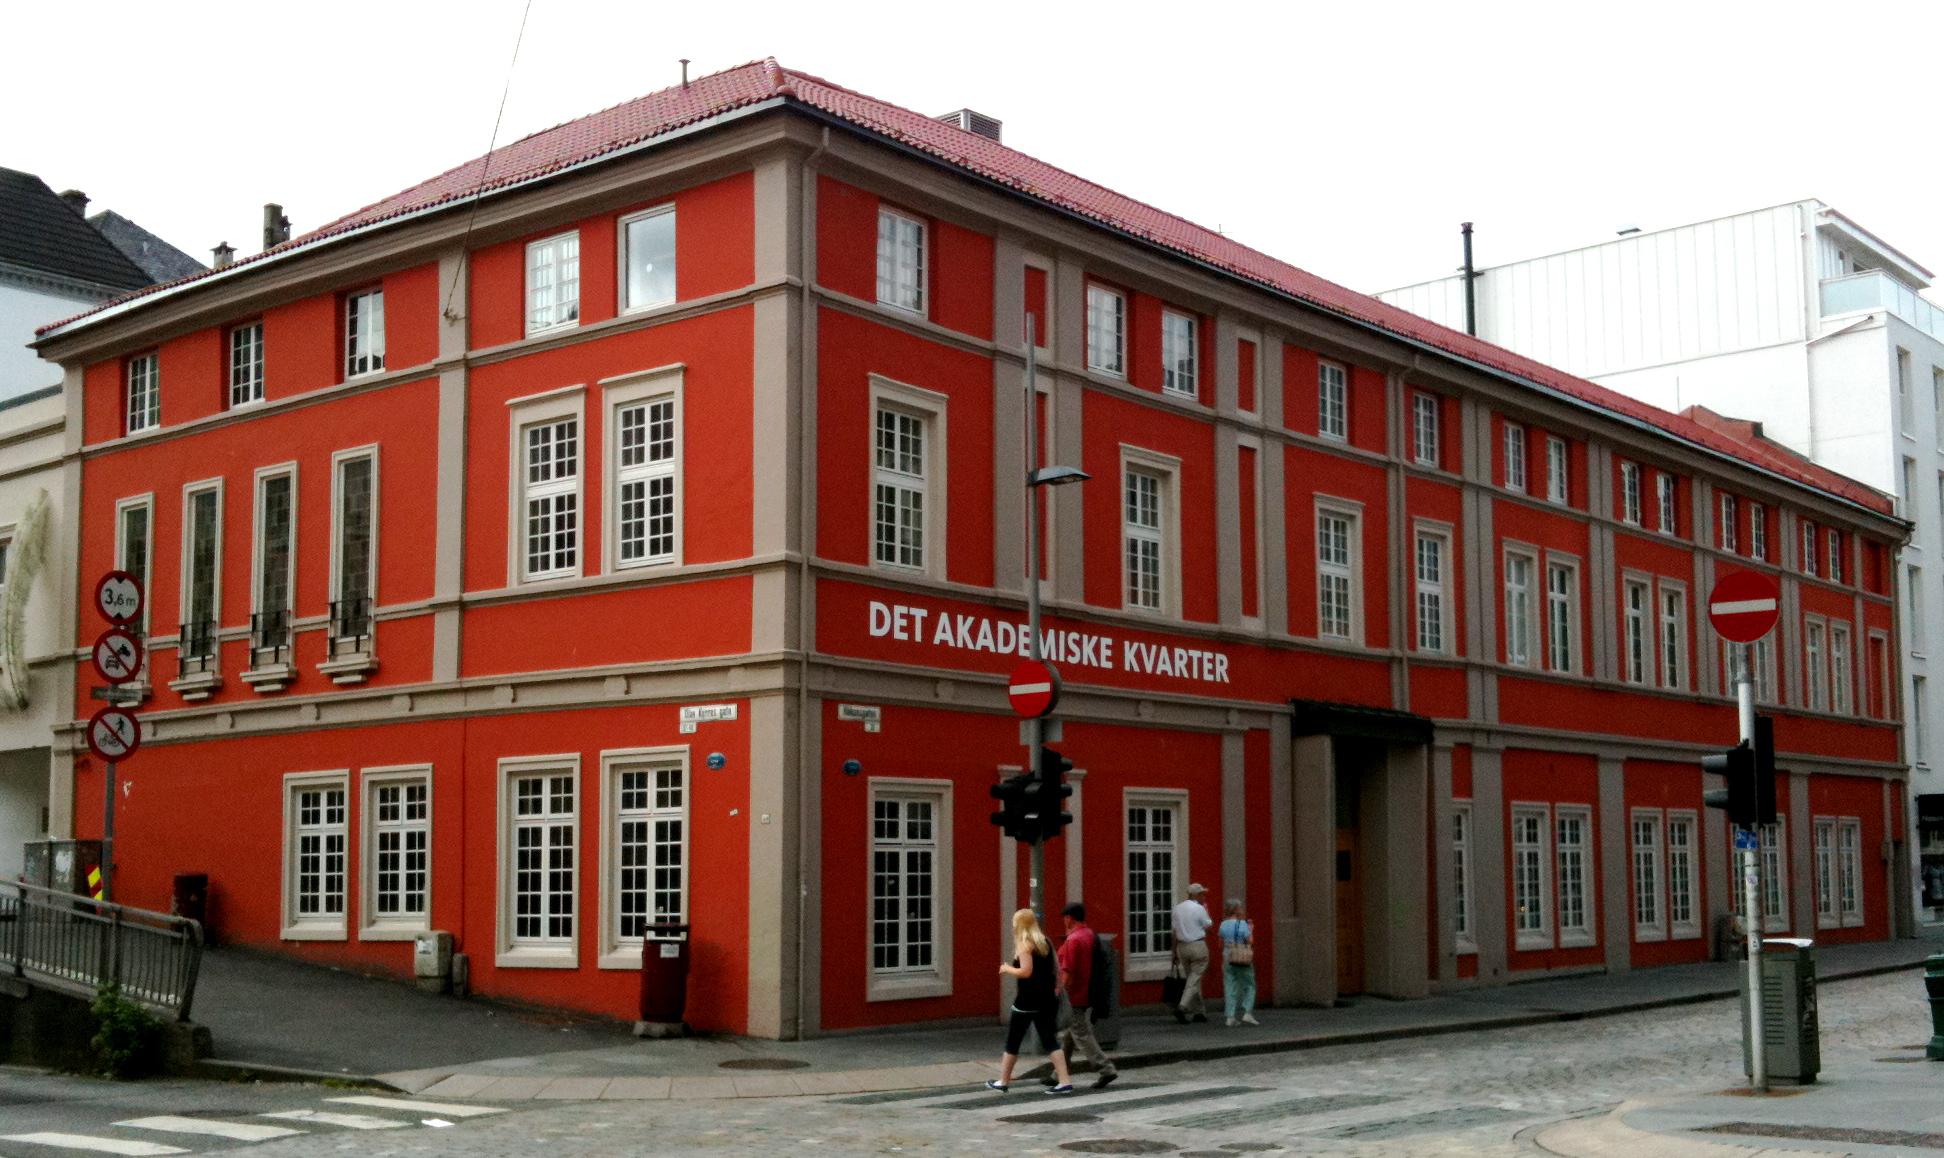 Det Akademiske Kvarter